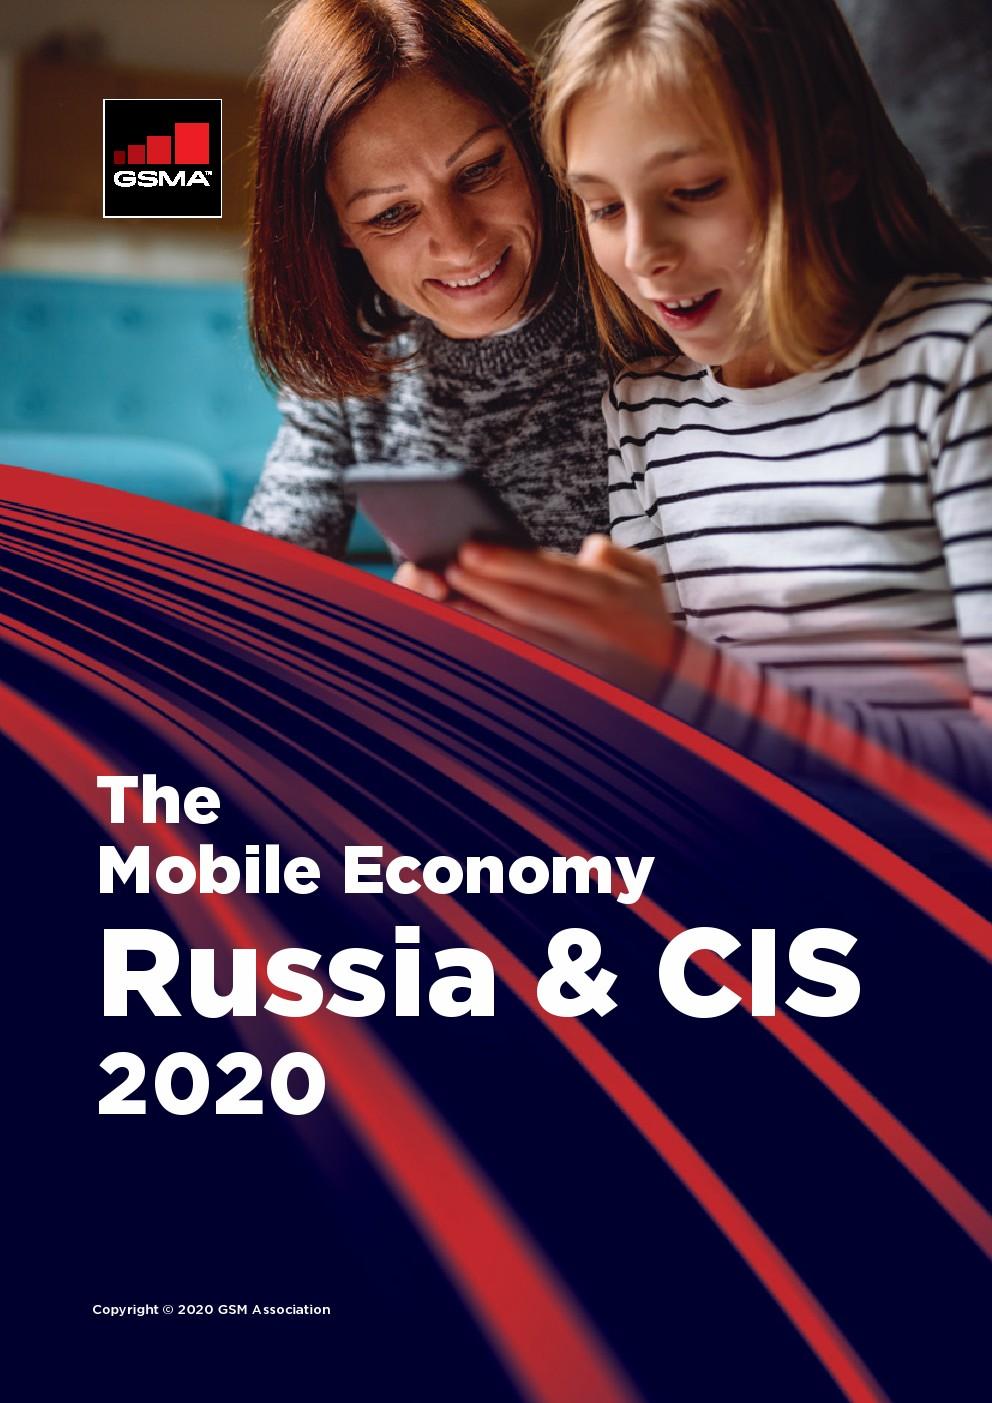 GSMA:2020年俄罗斯和独联体移动经济报告